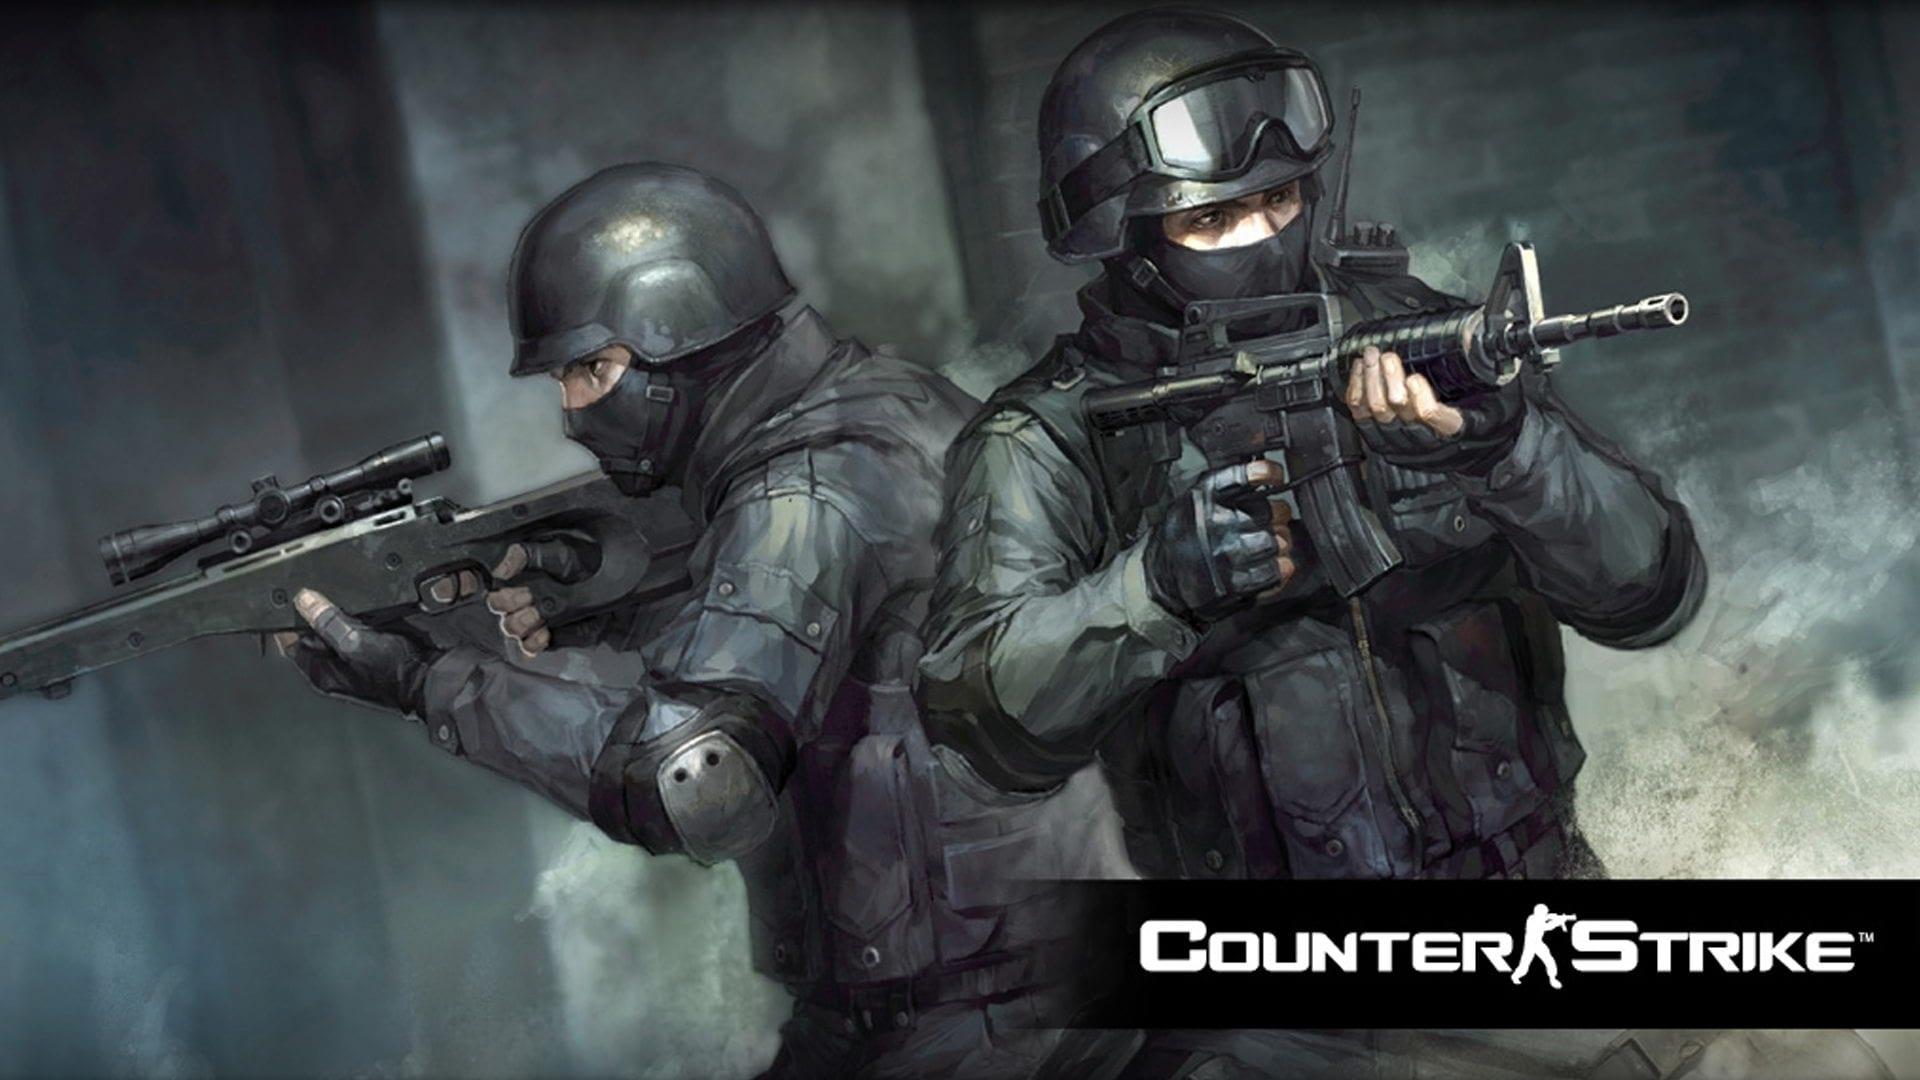 counter-strike 1.6 hd desktop wallpapers | 7wallpapers